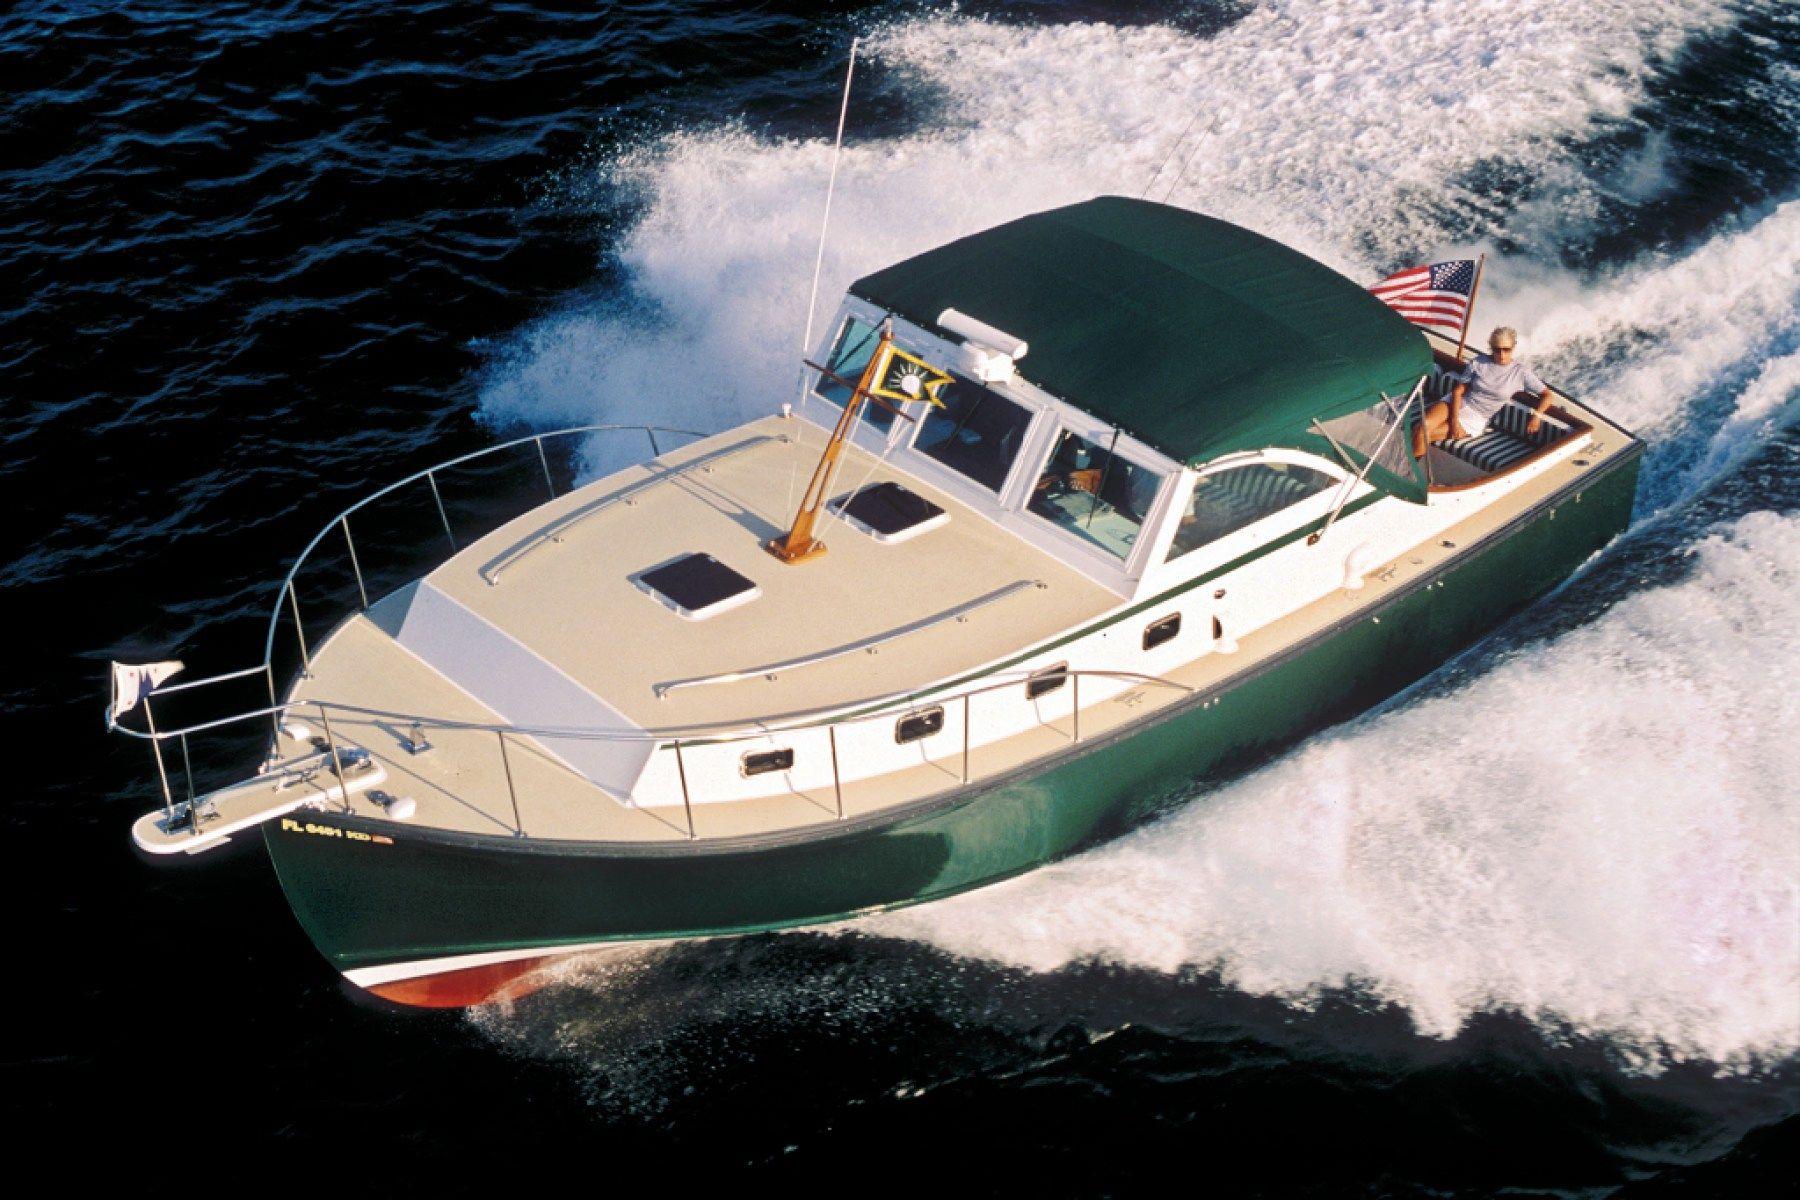 The Ellis 36 Boat companies, Boat, Downeast cruiser